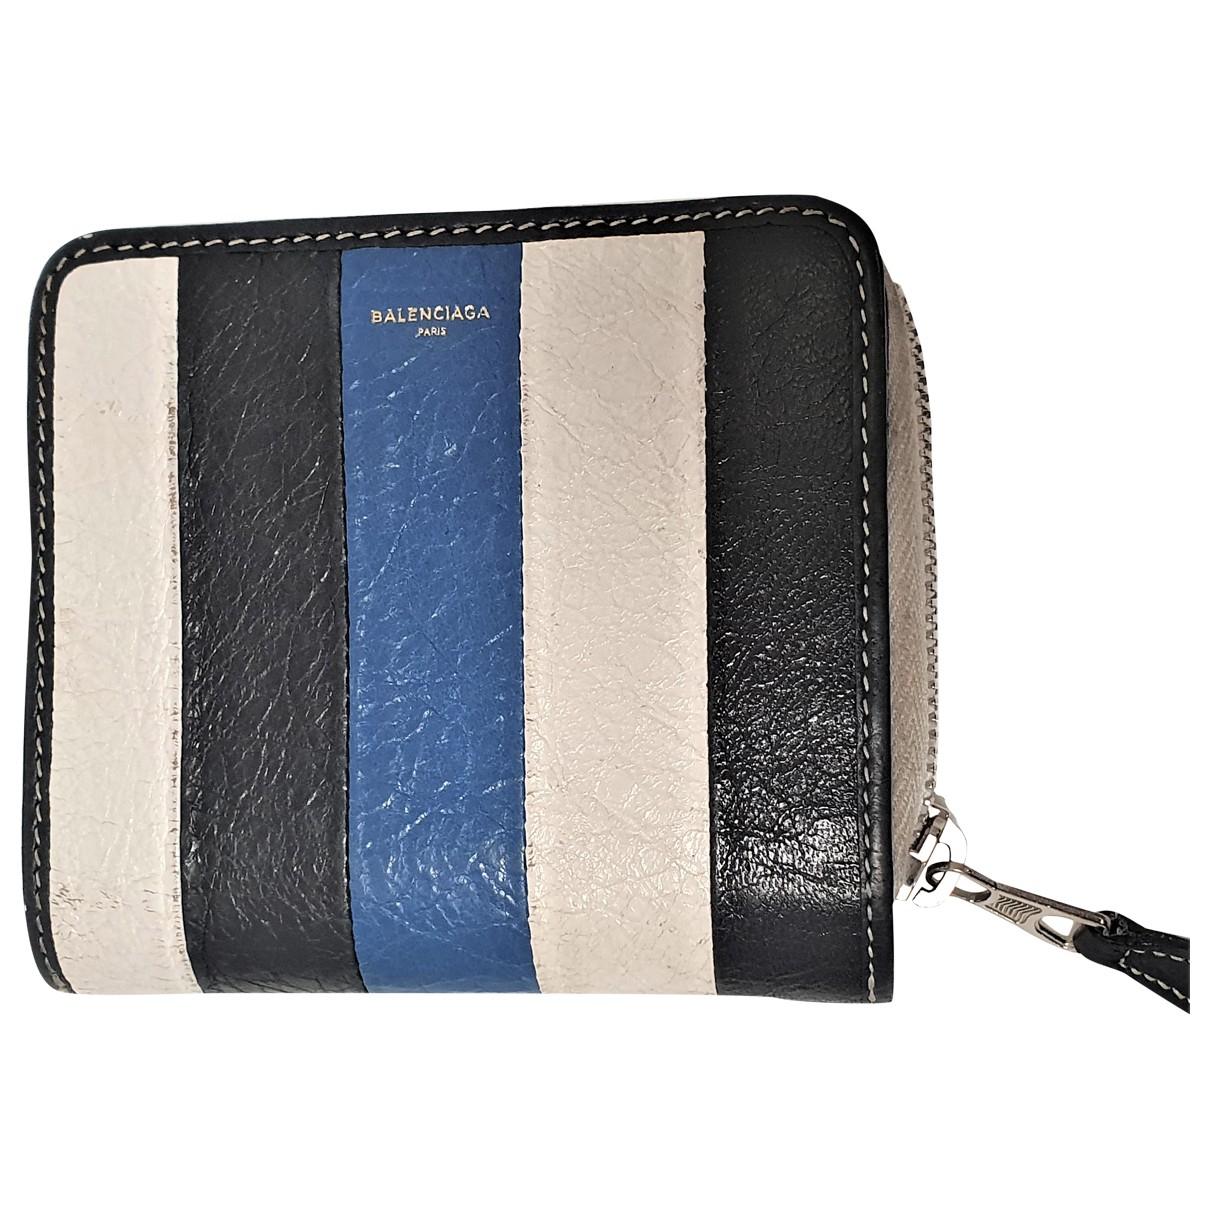 Balenciaga \N Multicolour Leather wallet for Women \N